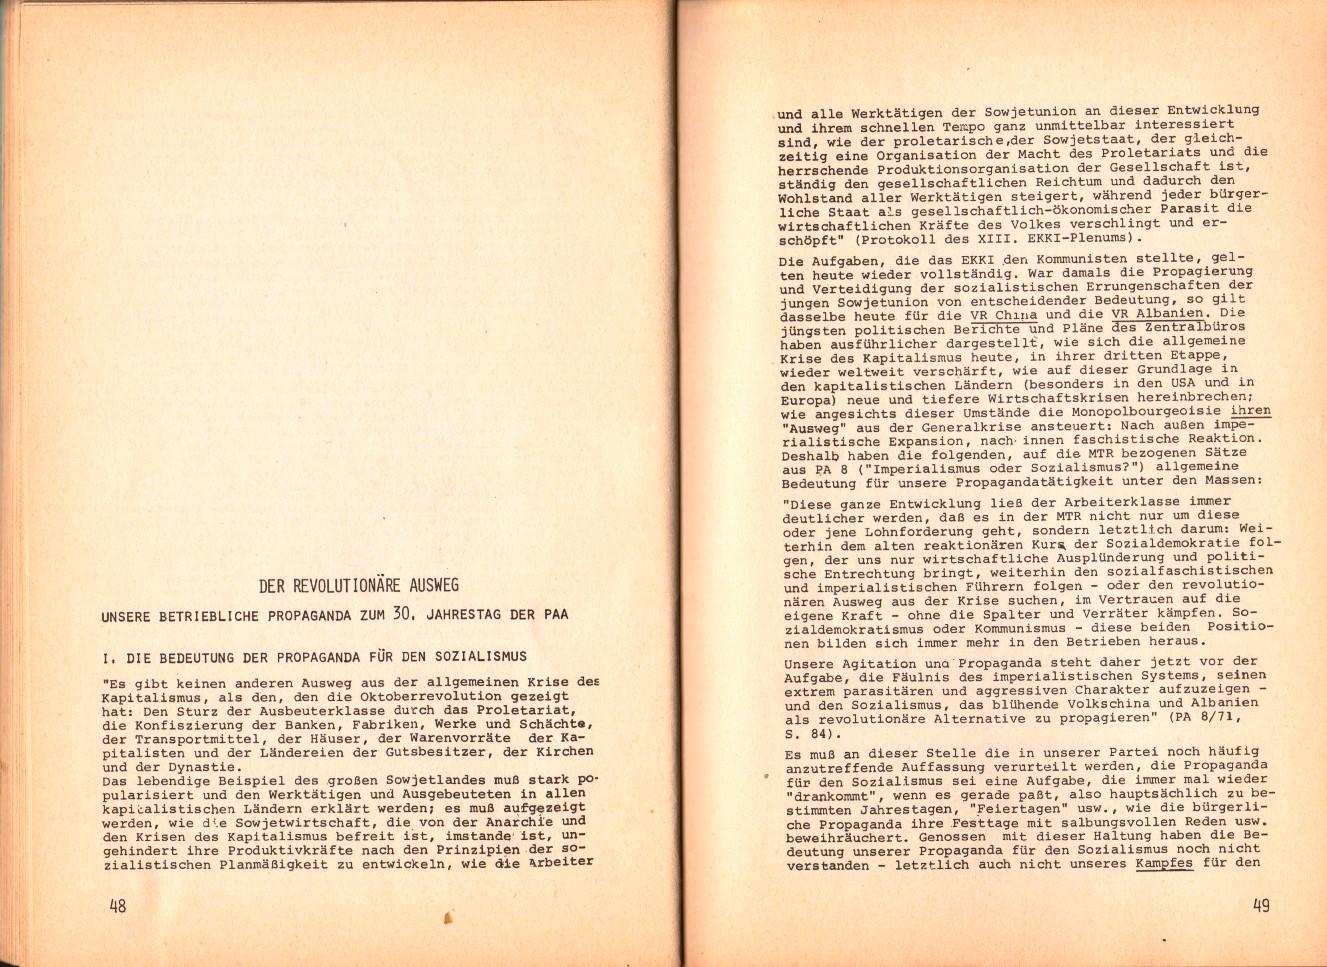 ZB_Parteiarbeiter_1971_10_26